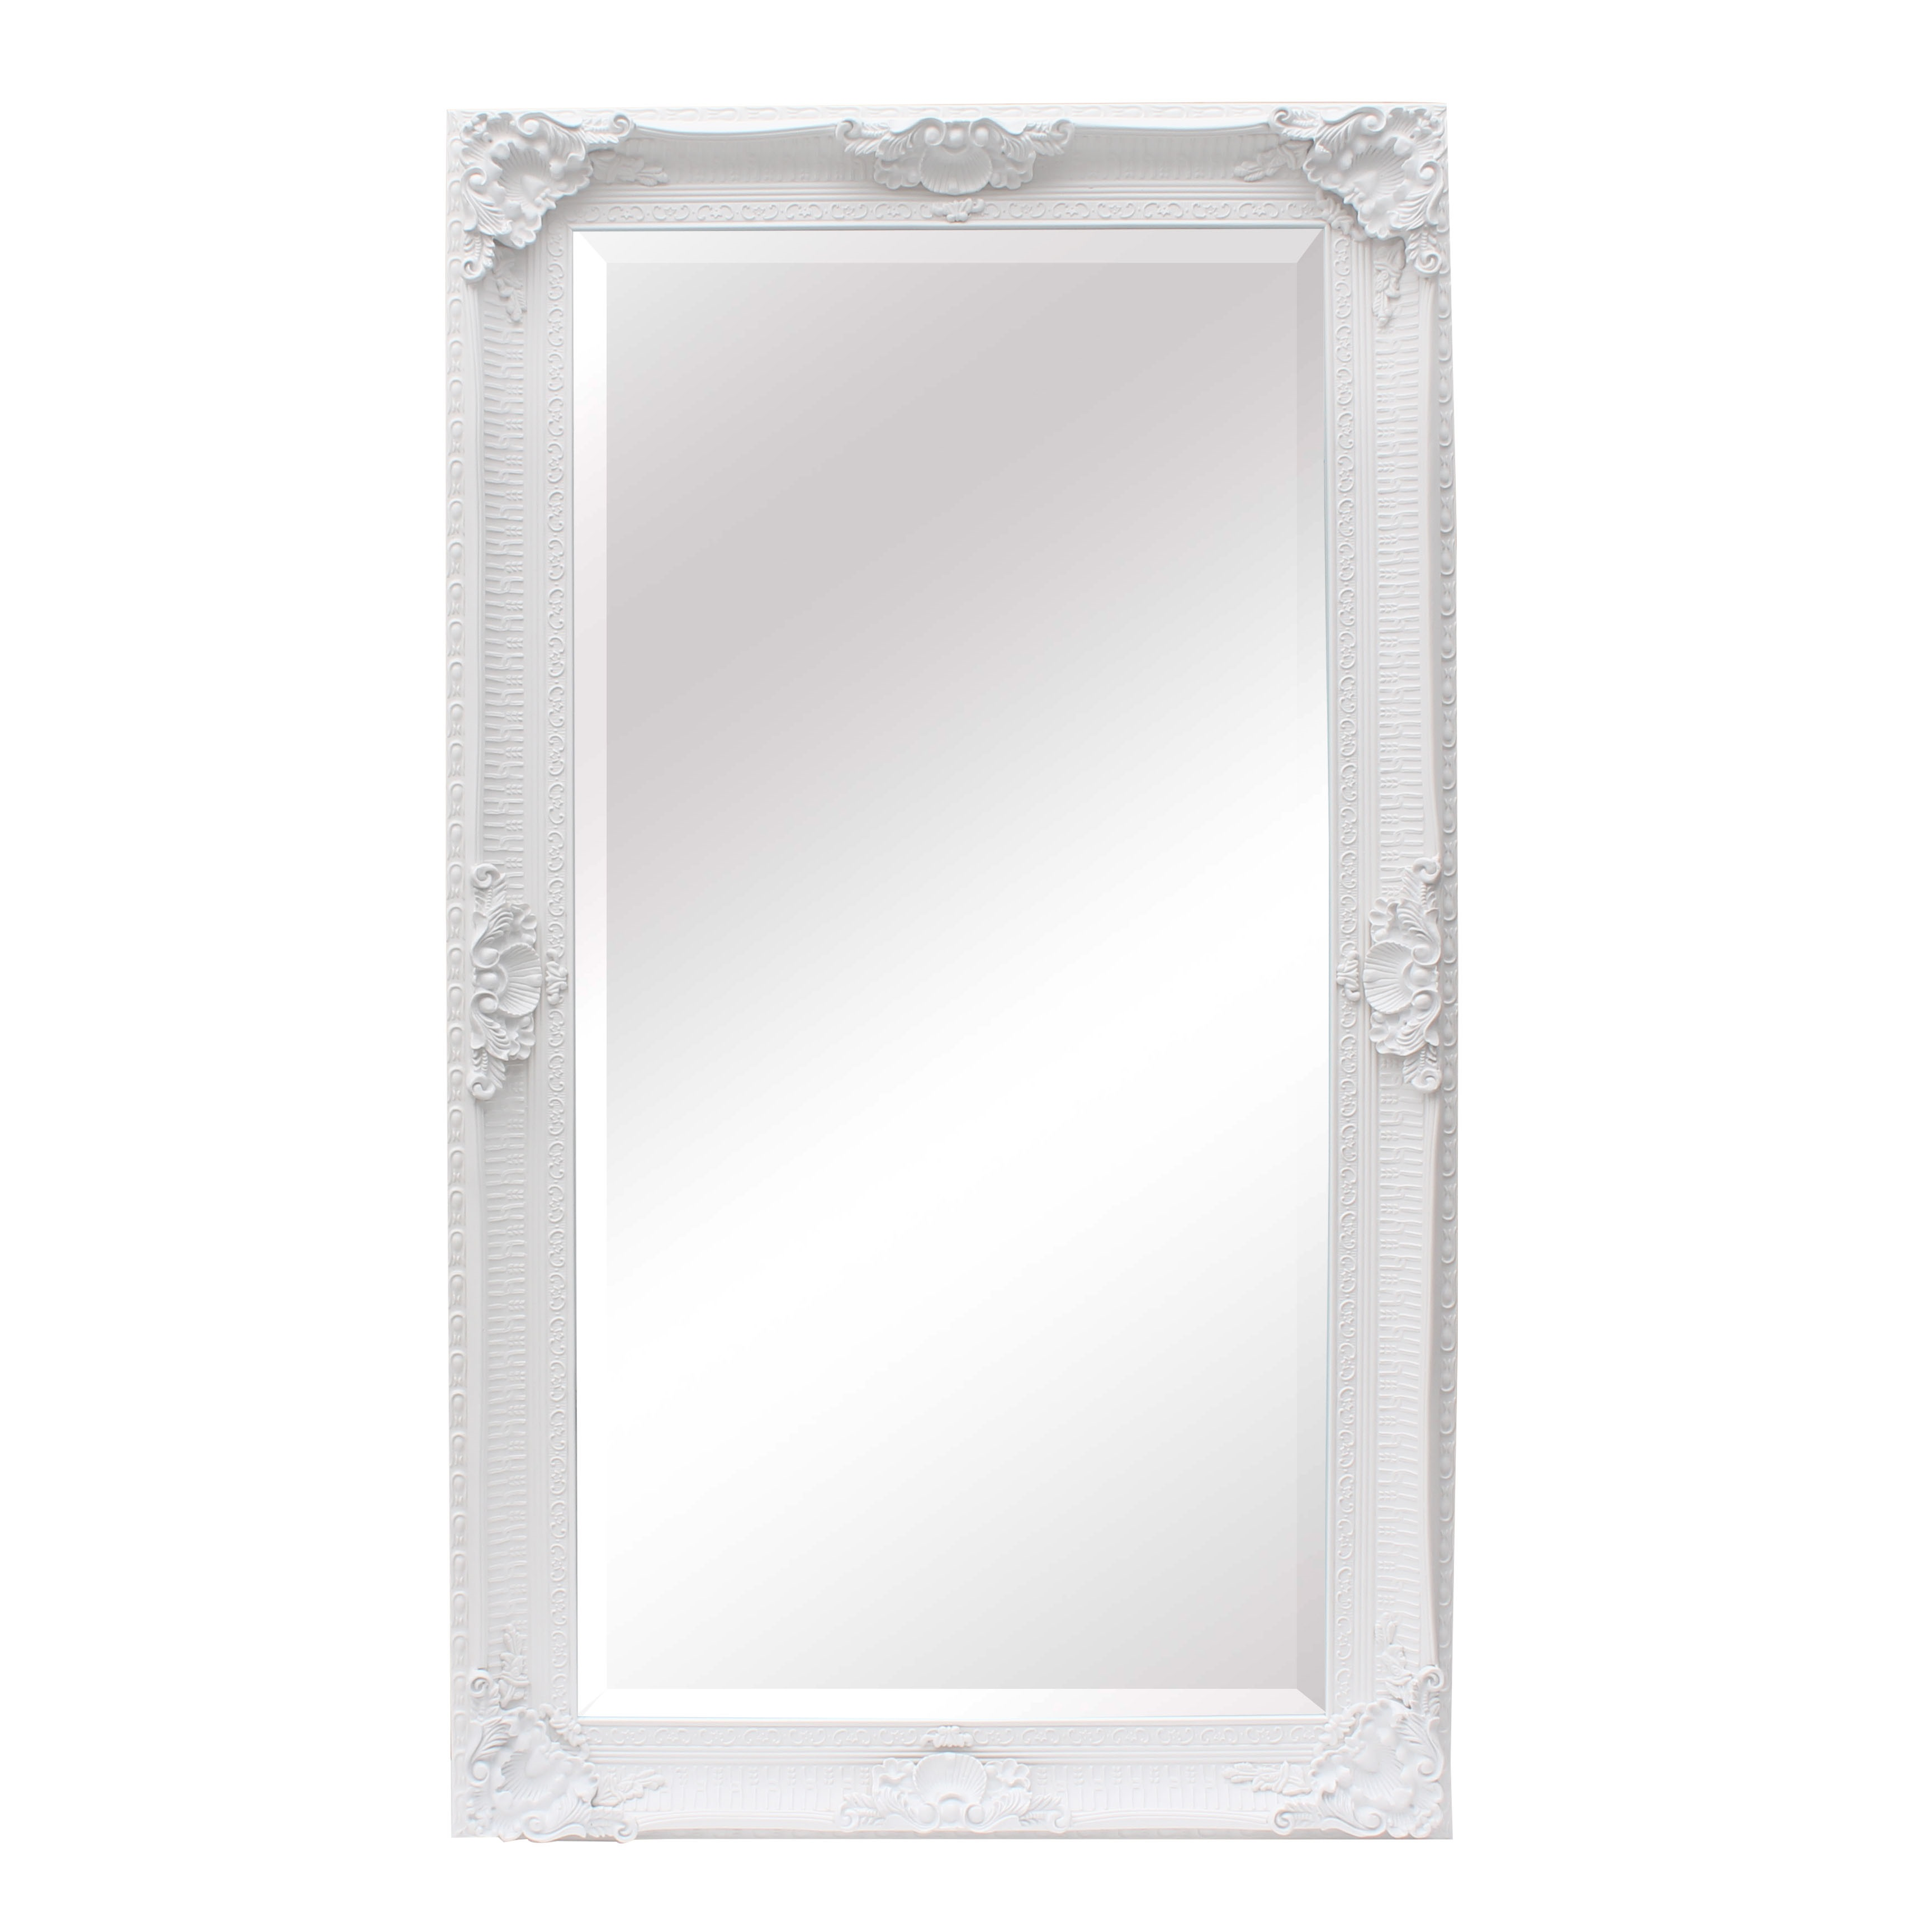 Extra Large Ornate White Mirror